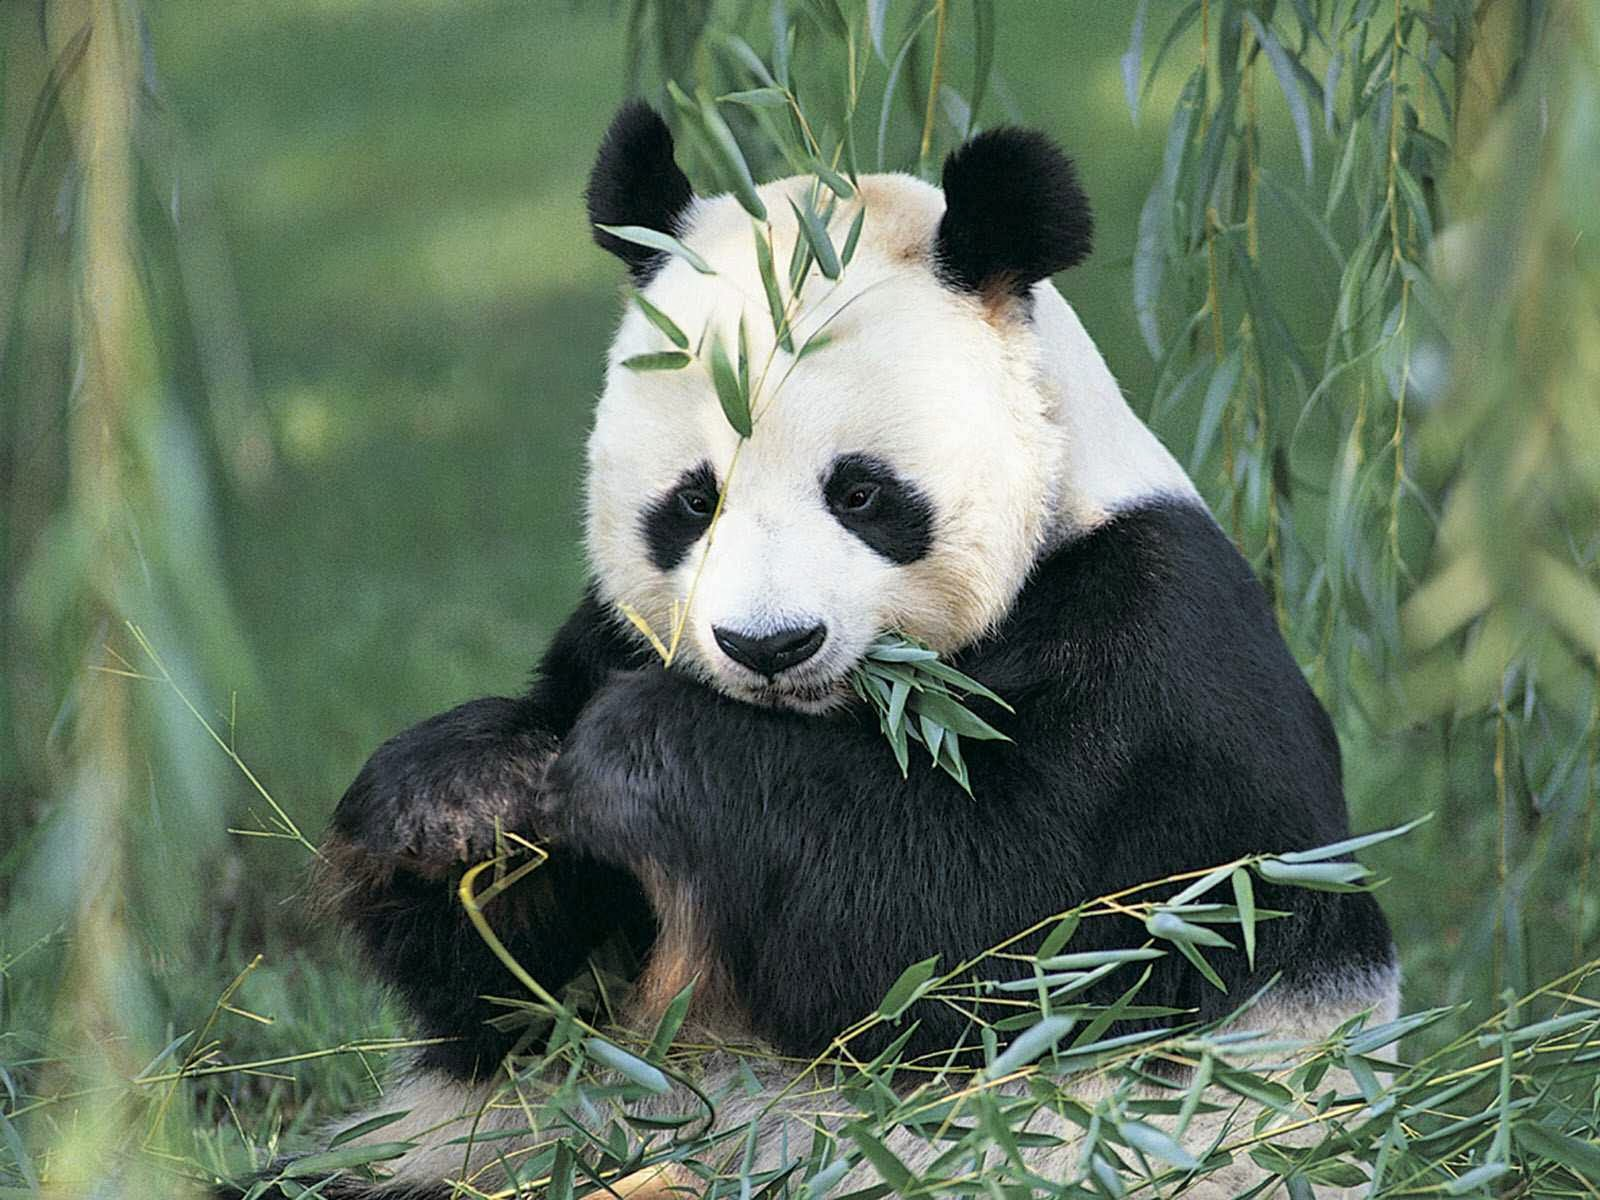 Unduh 76+ Gambar Hewan Panda Lucu Keren Gratis